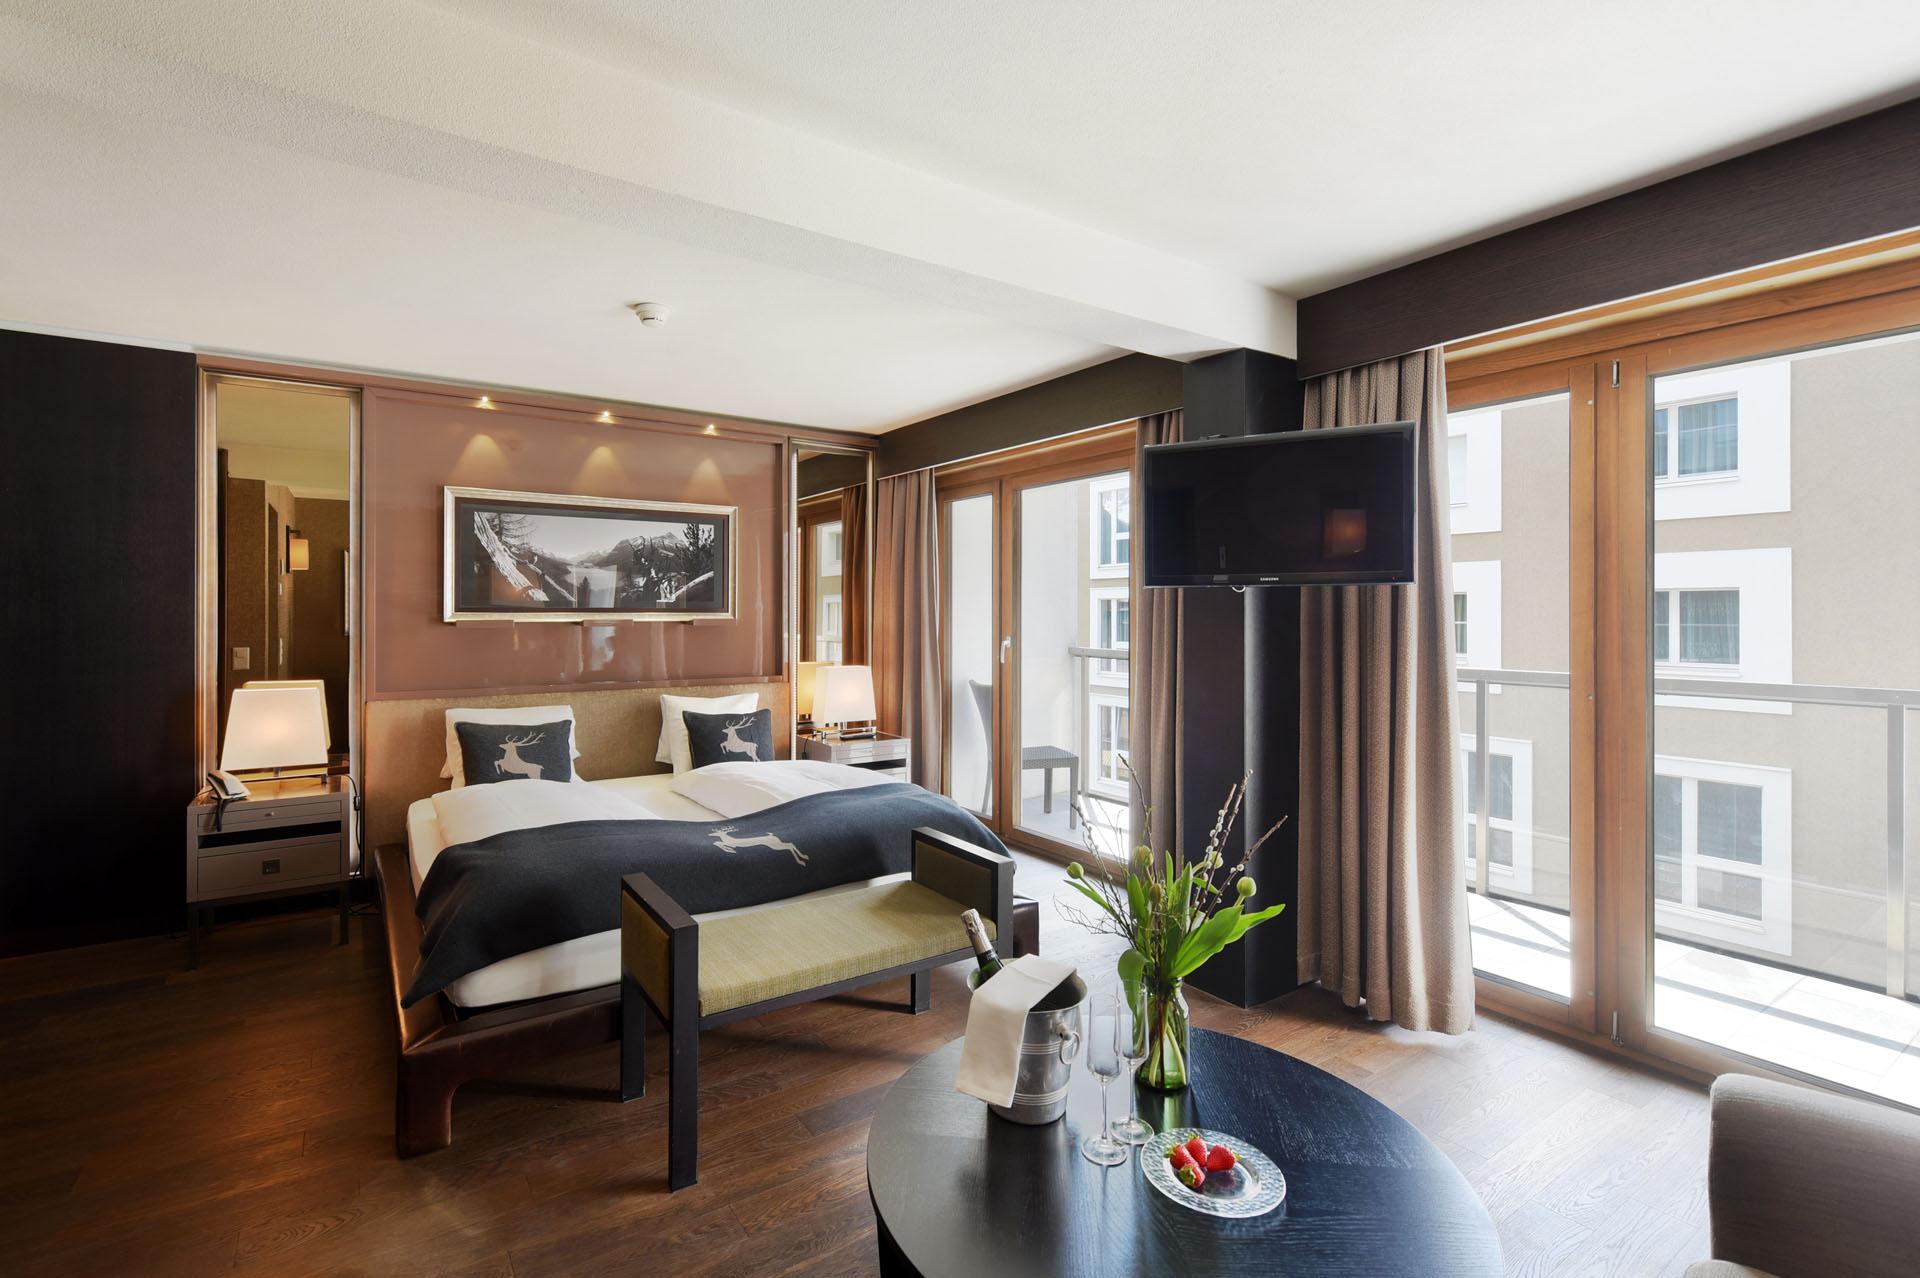 recensione hotel piz st. moritz